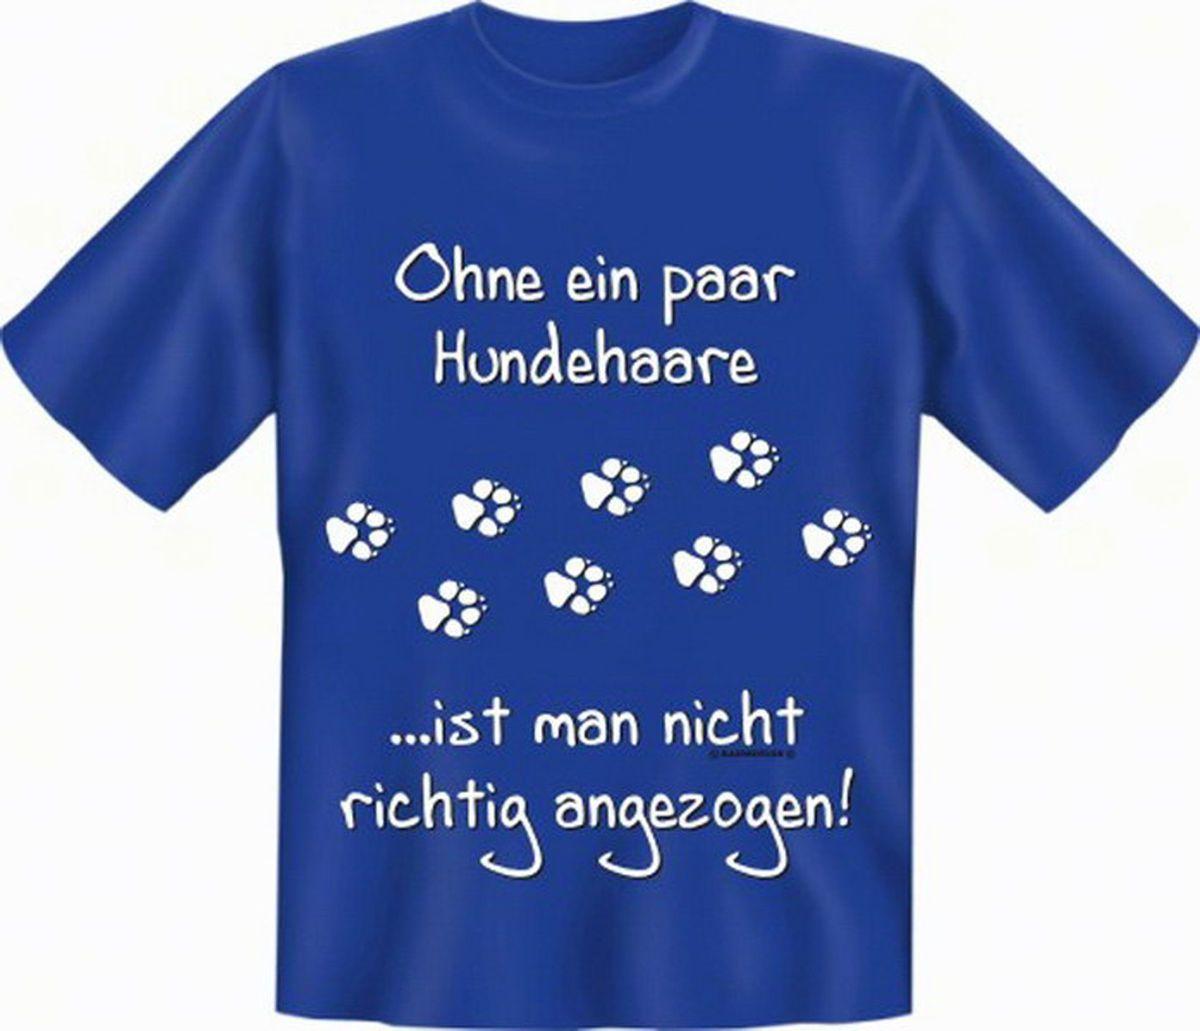 Full Size of Lustiges Hunde Motiv T Shirt Sprche Kindershirt Tier Lustige Sprüche T Shirt Coole Männer Junggesellenabschied Wandtattoo Jutebeutel Bettwäsche Wandtattoos Küche Lustige T Shirt Sprüche